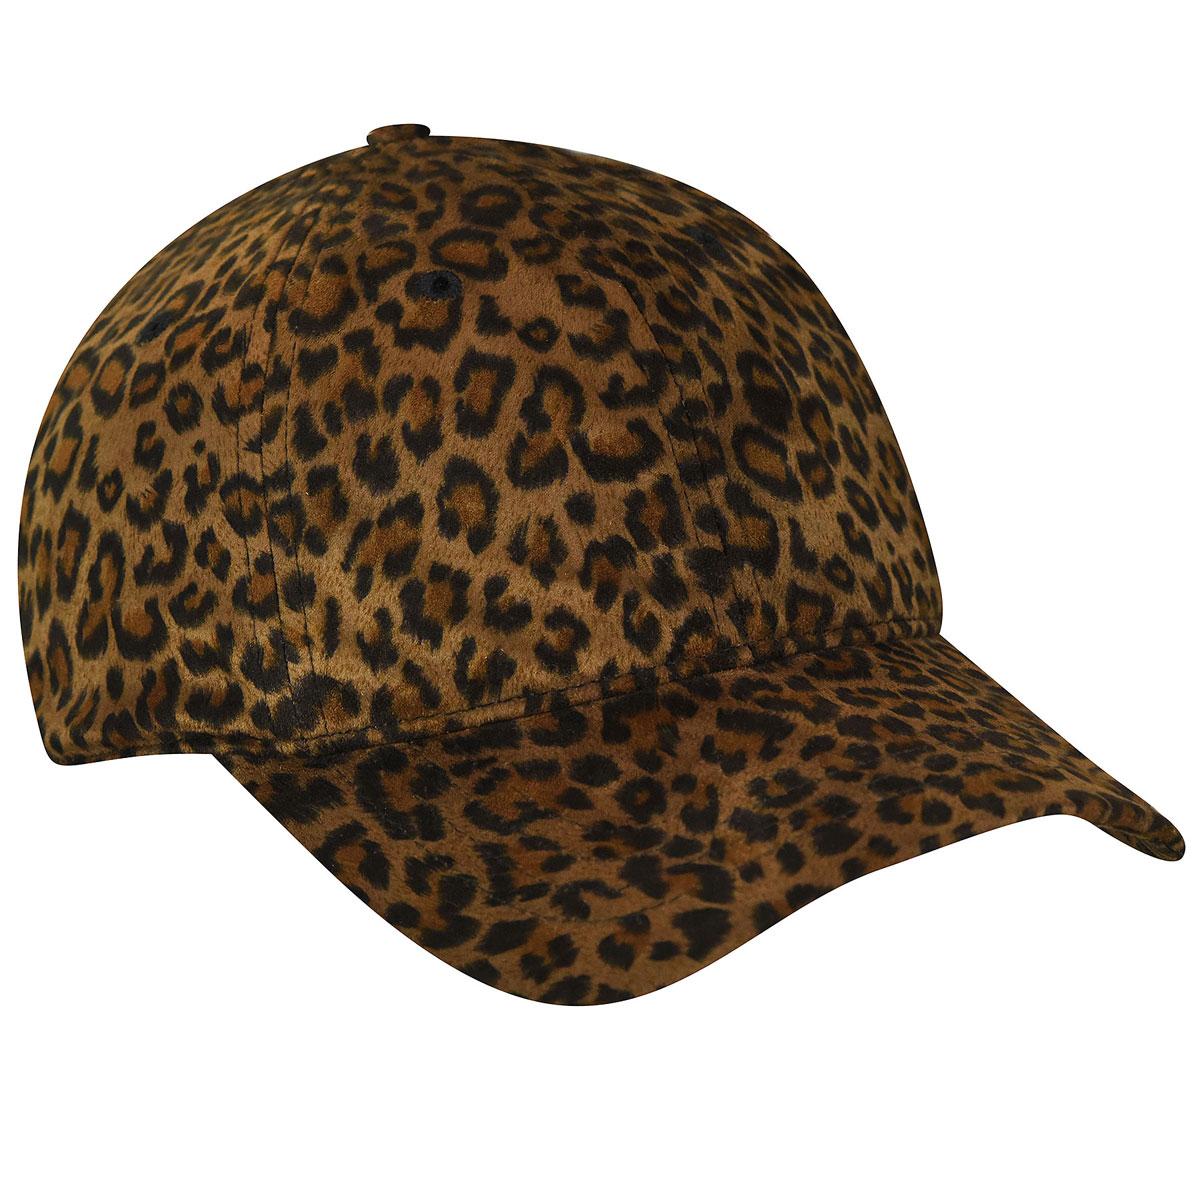 Betmar Leopard Baseball Cap in Leopard